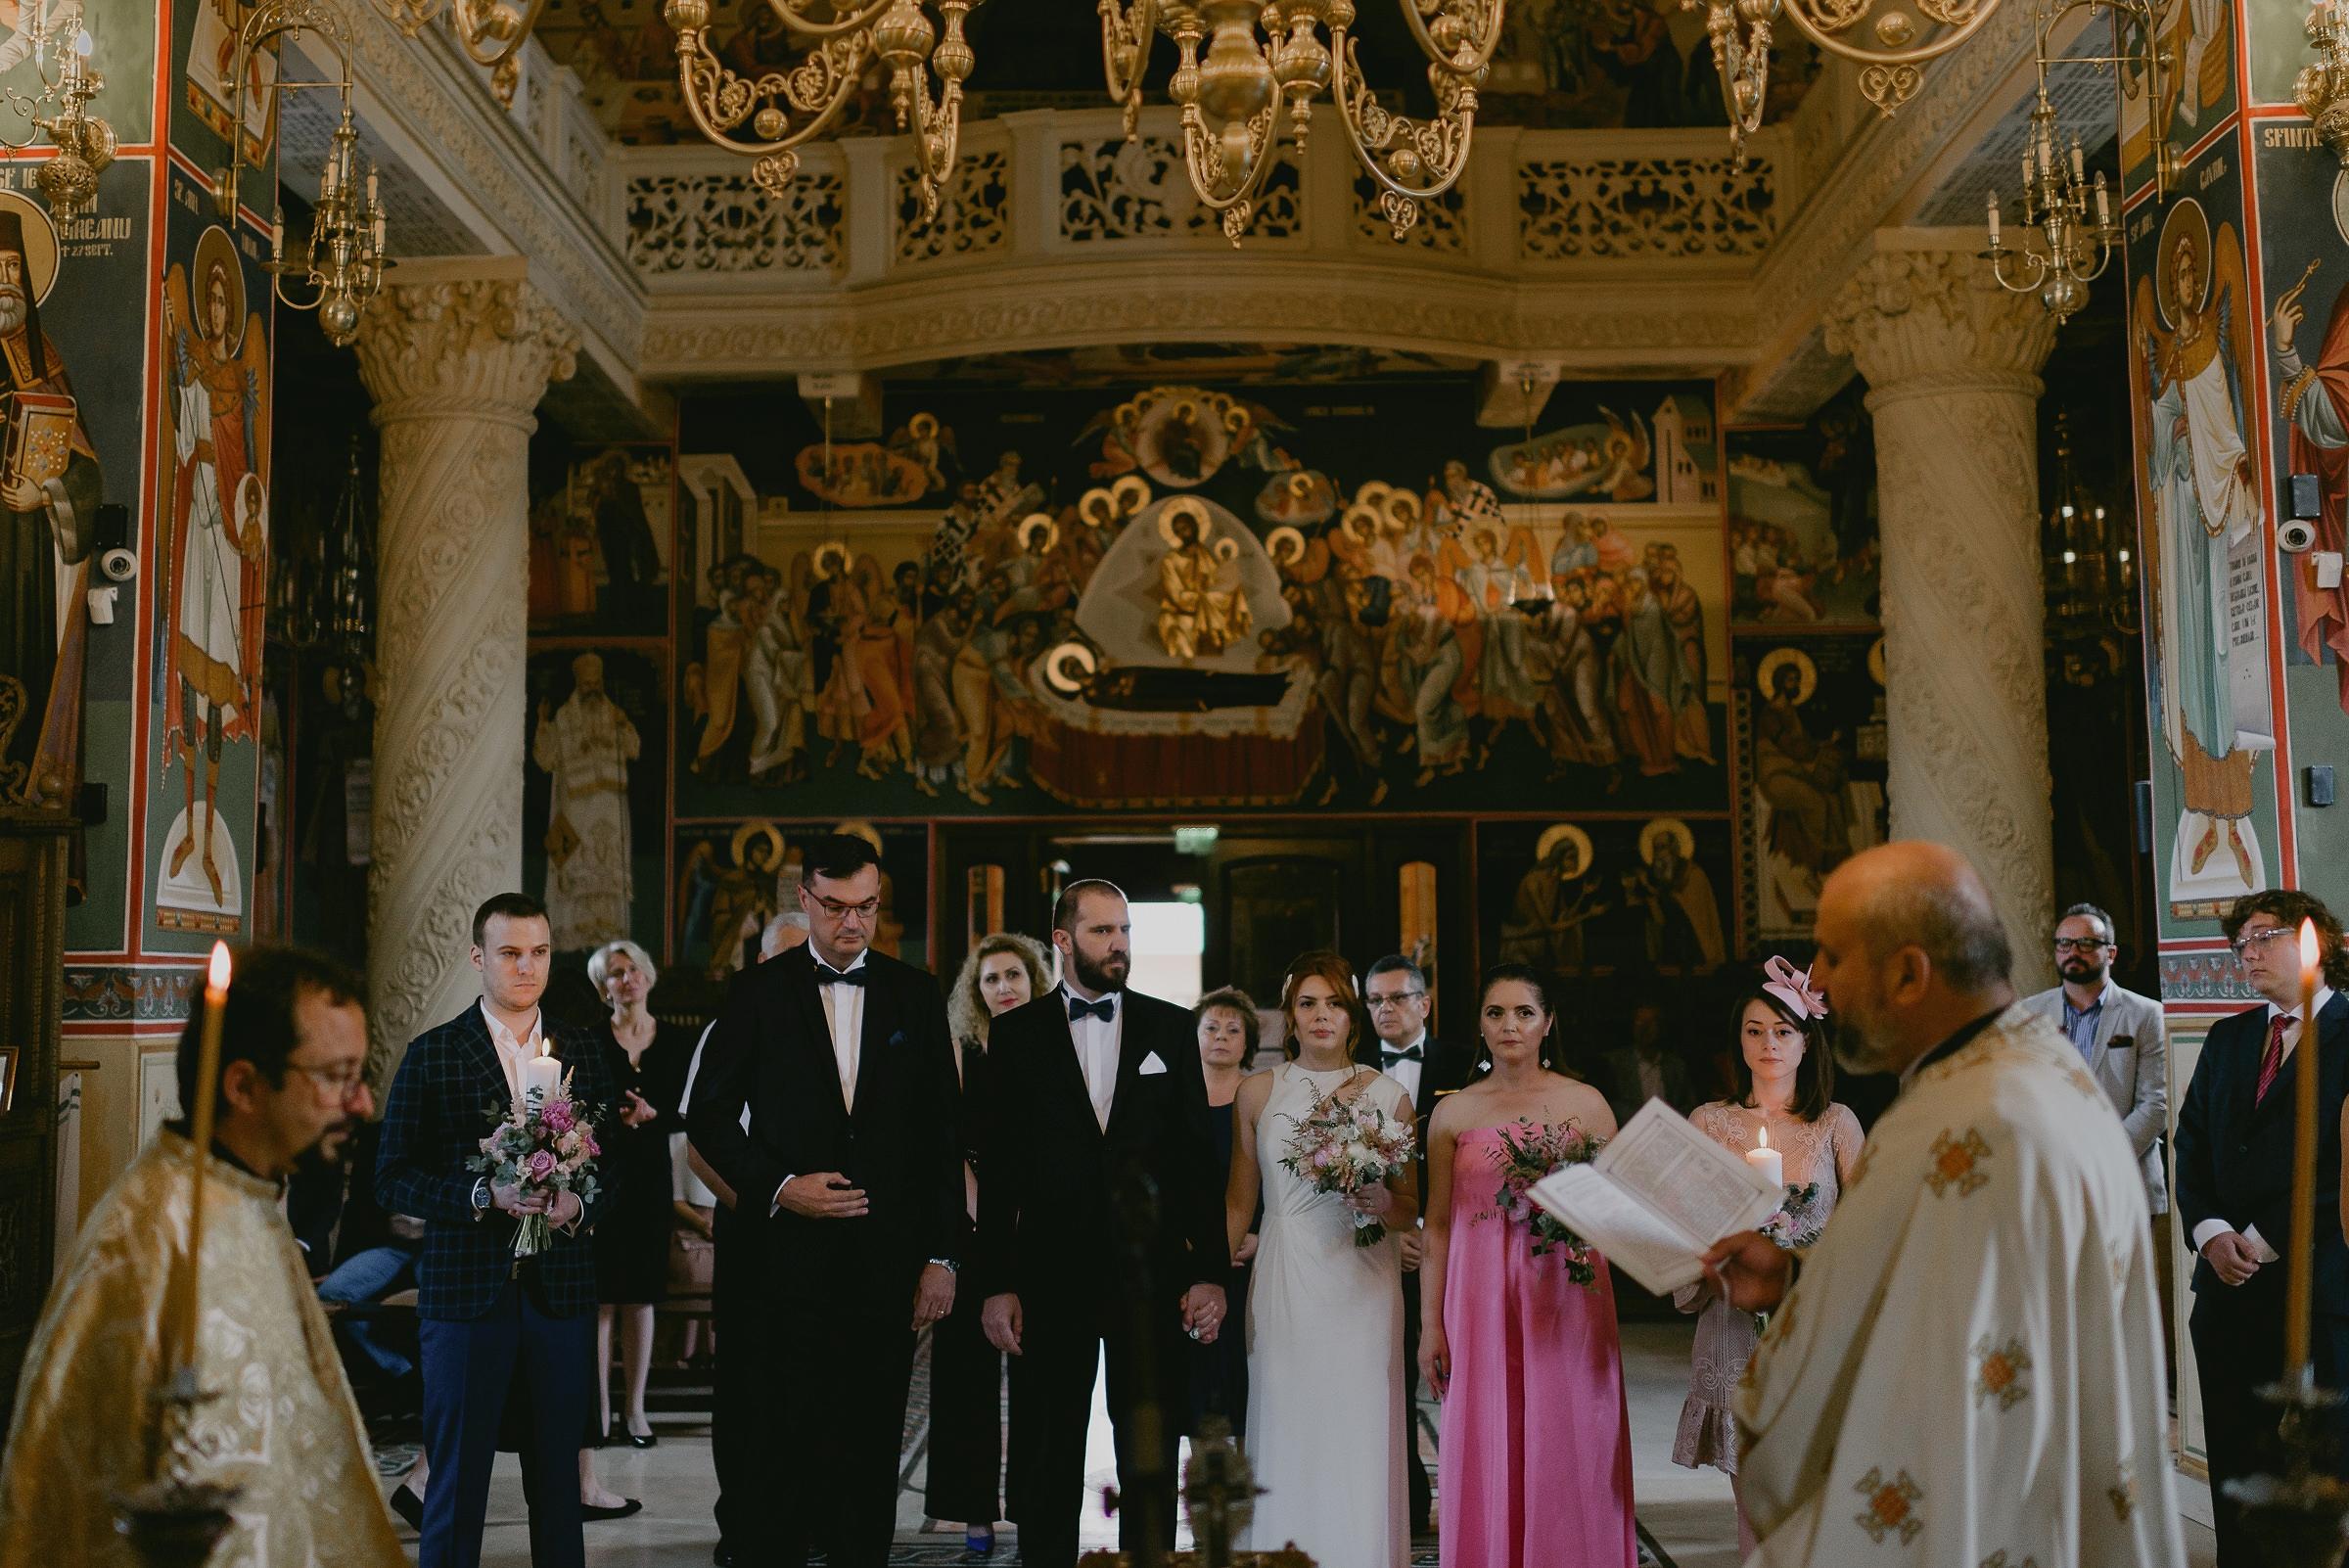 Nunta In Gradina Ceremonie Religioasa